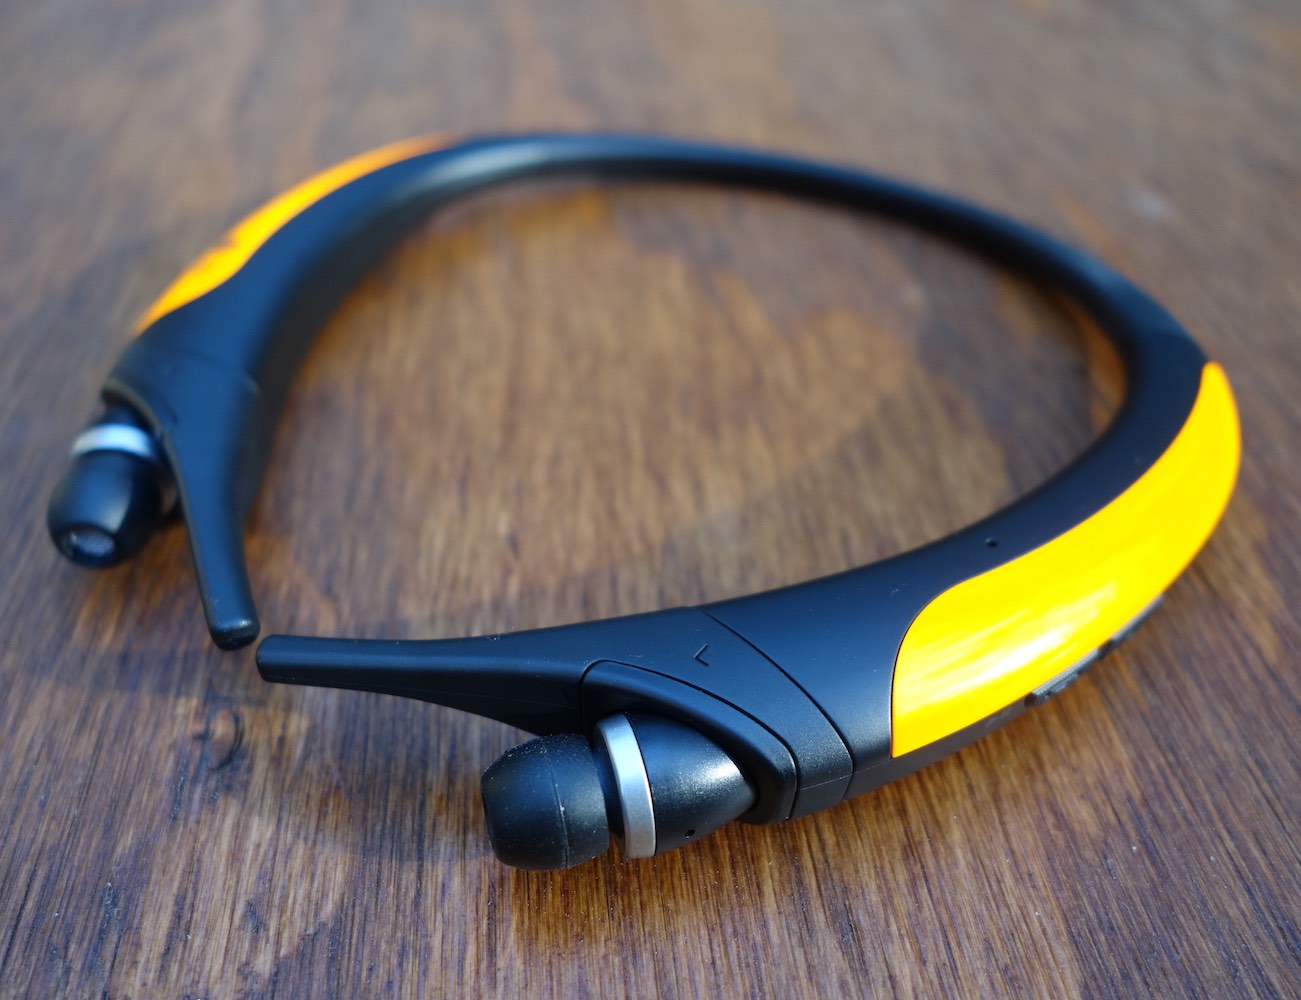 lg-tone-active-premium-wireless-stereo-headset-5